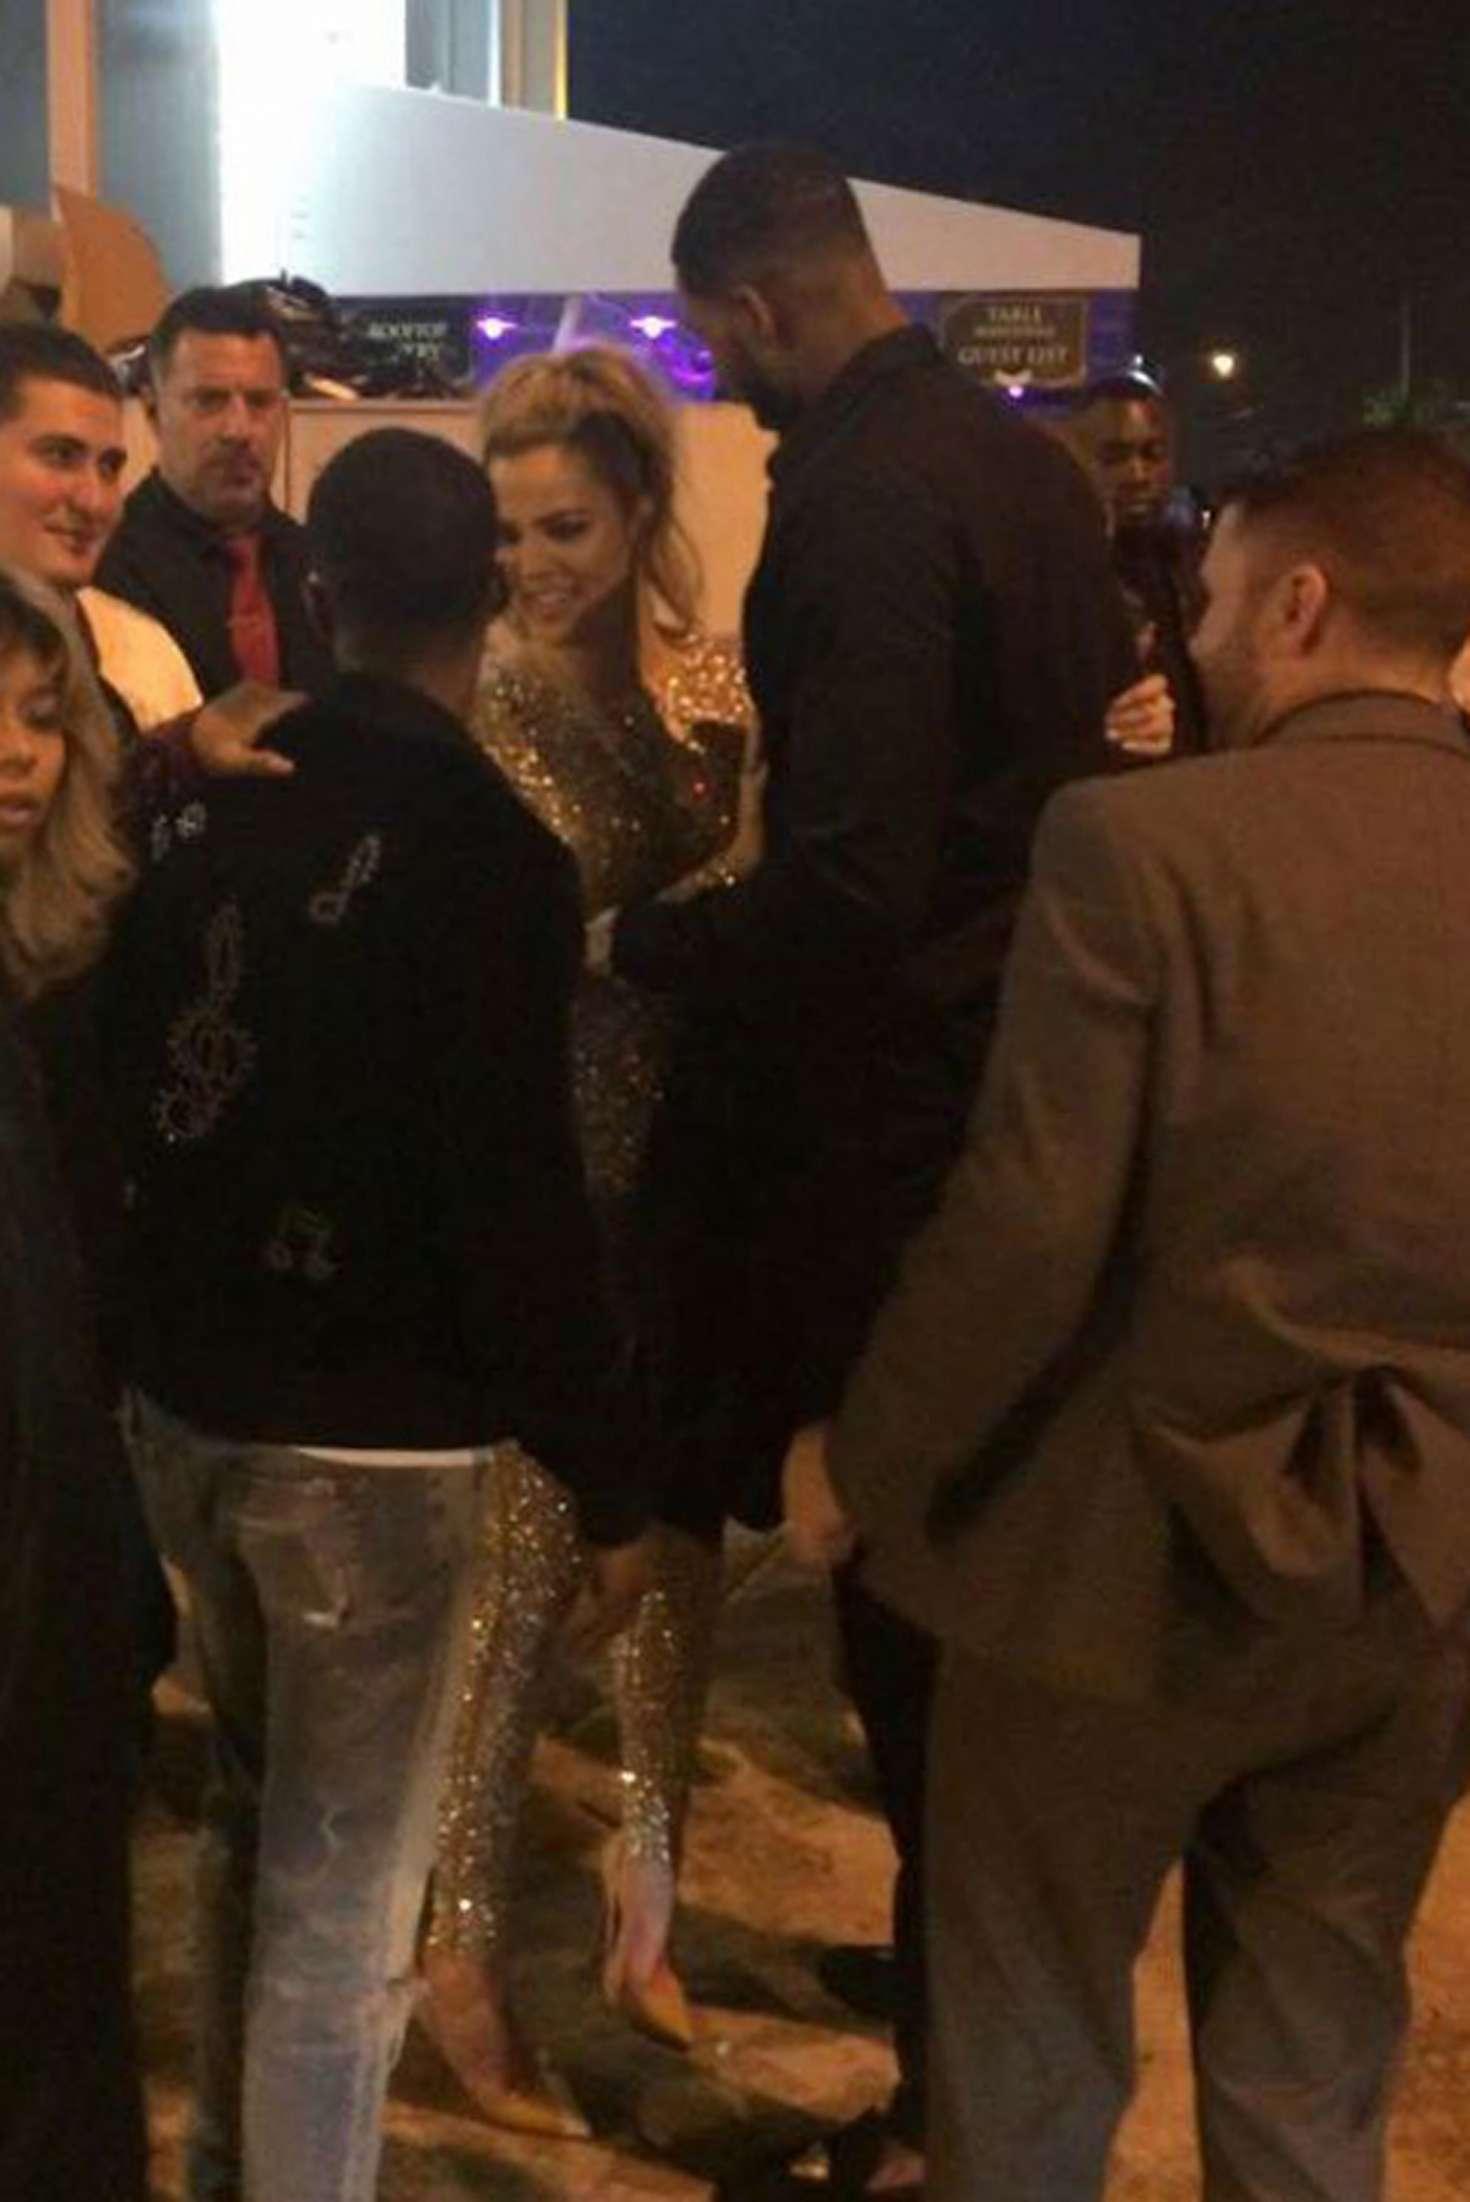 Khloe Kardashian 2017 : Khloe Kardashian at Club Space in Miami -04